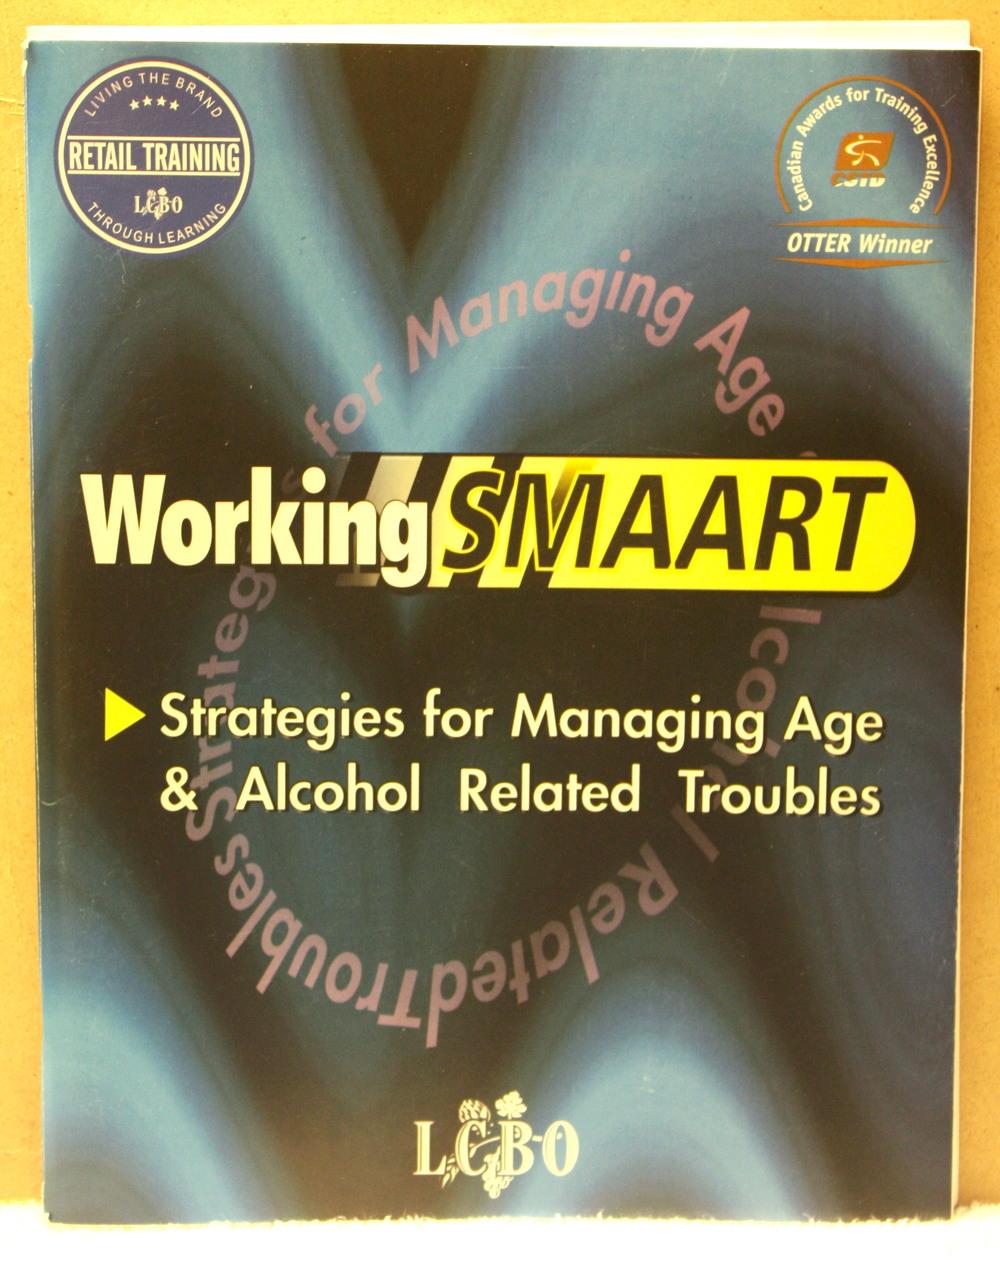 Working Smaart_LCBO Employee Training Book (2007).JPG